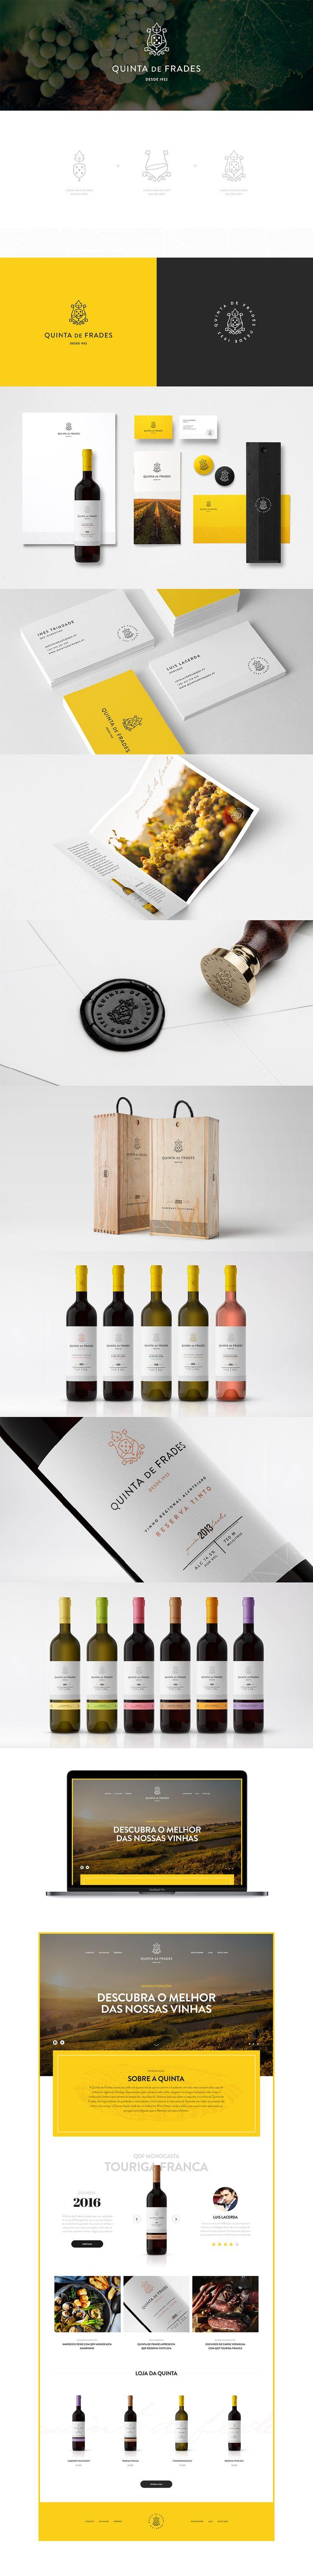 Branding Quinta de Frades - Ivory Black, Wine brand, Packaging, Wine, Vineyard